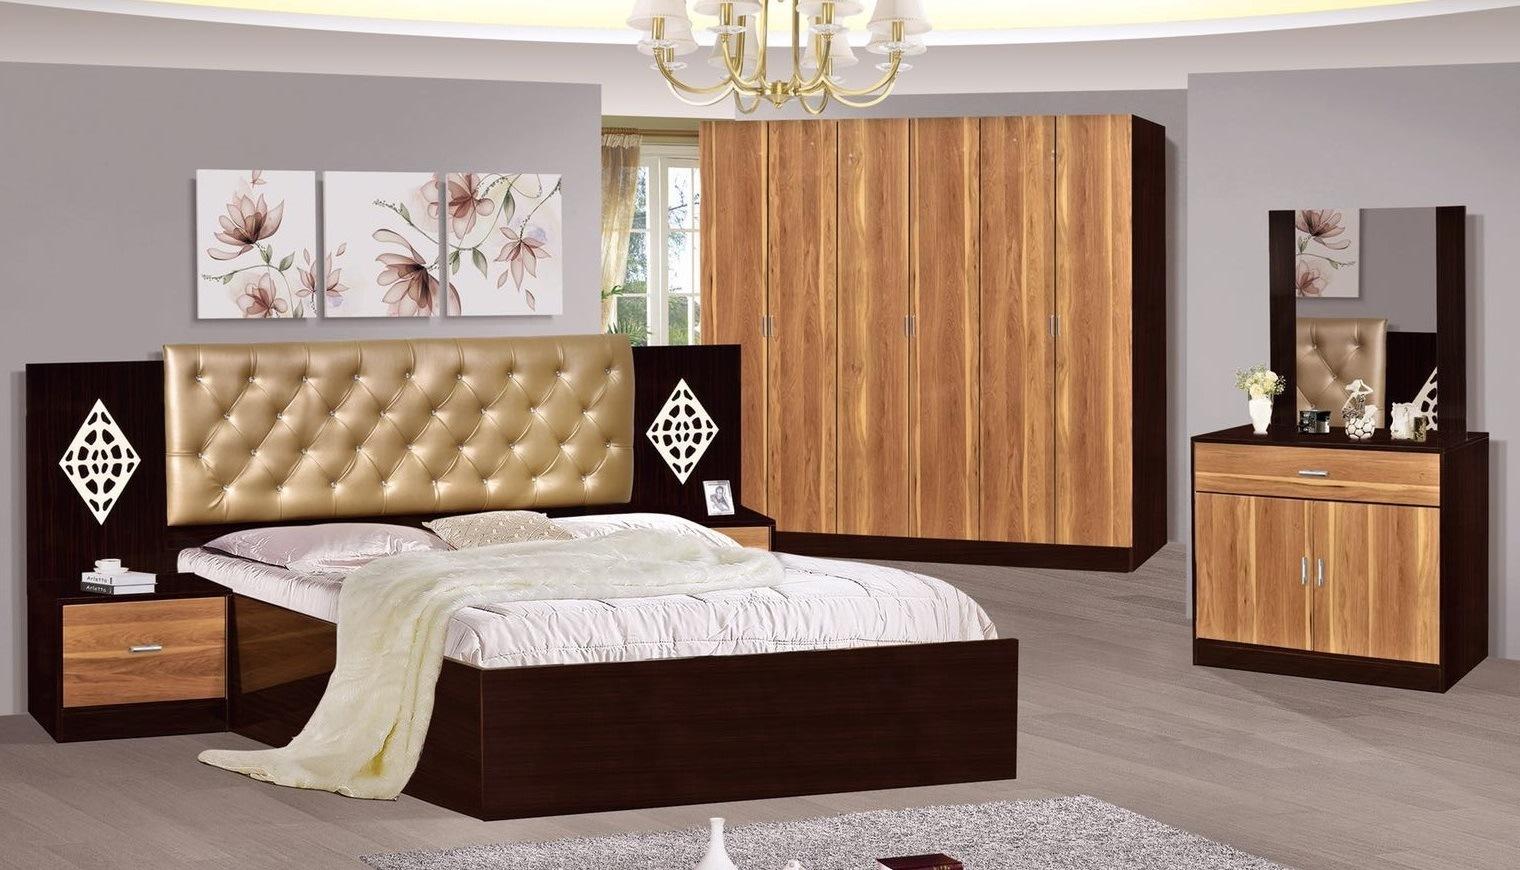 تناقض أنت اختبار دربفيل Double Bed New Design Cabuildingbridges Org